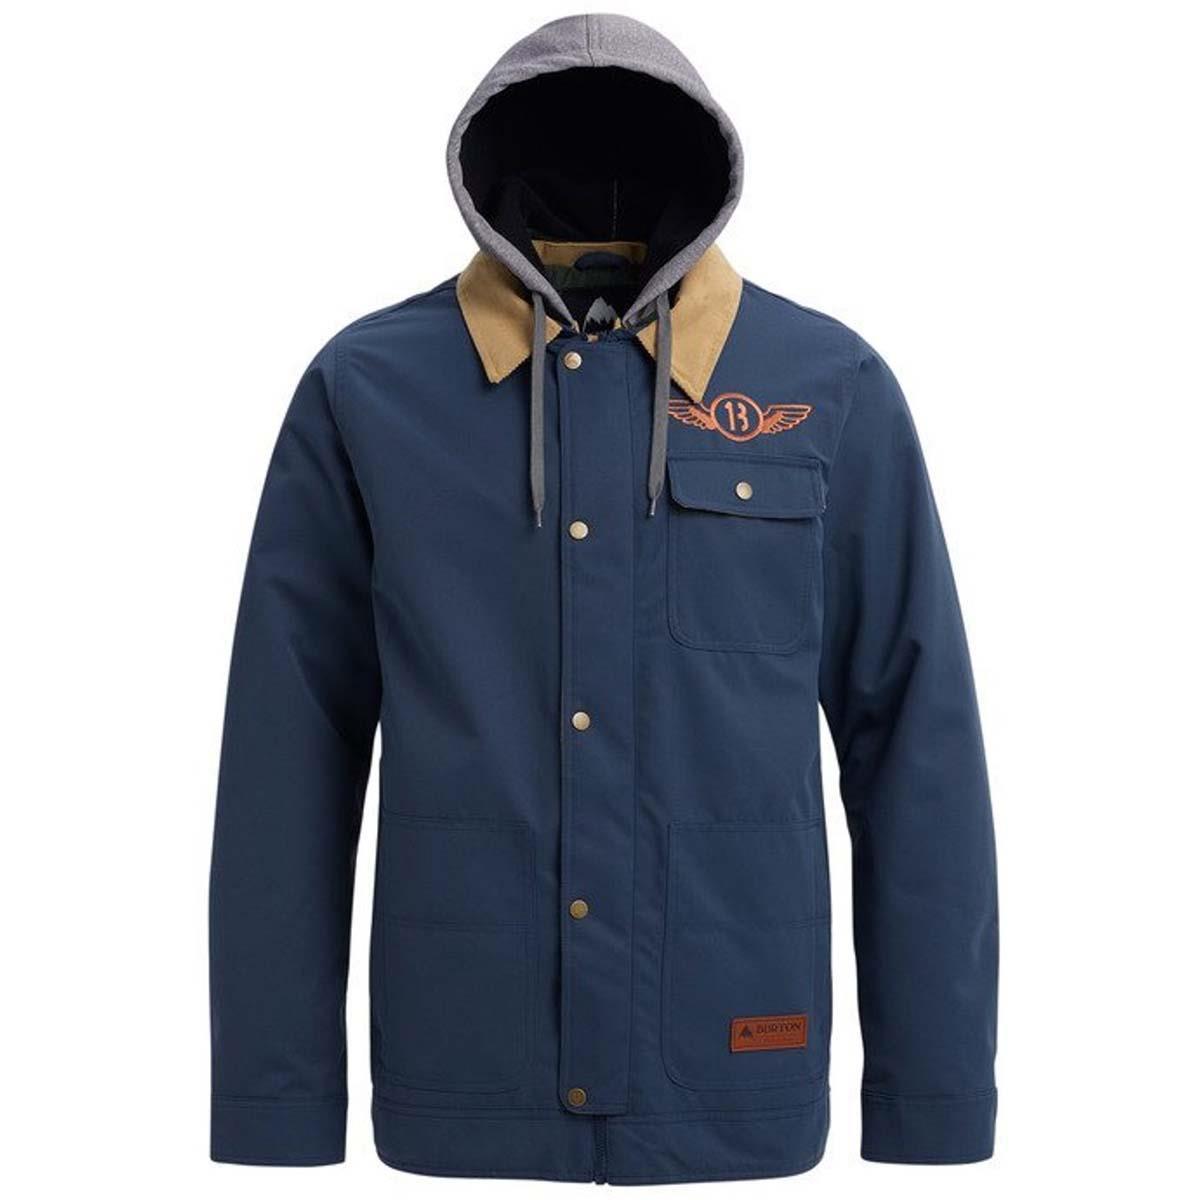 81ebb7f712 Burton Dunmore Jacket - Men's